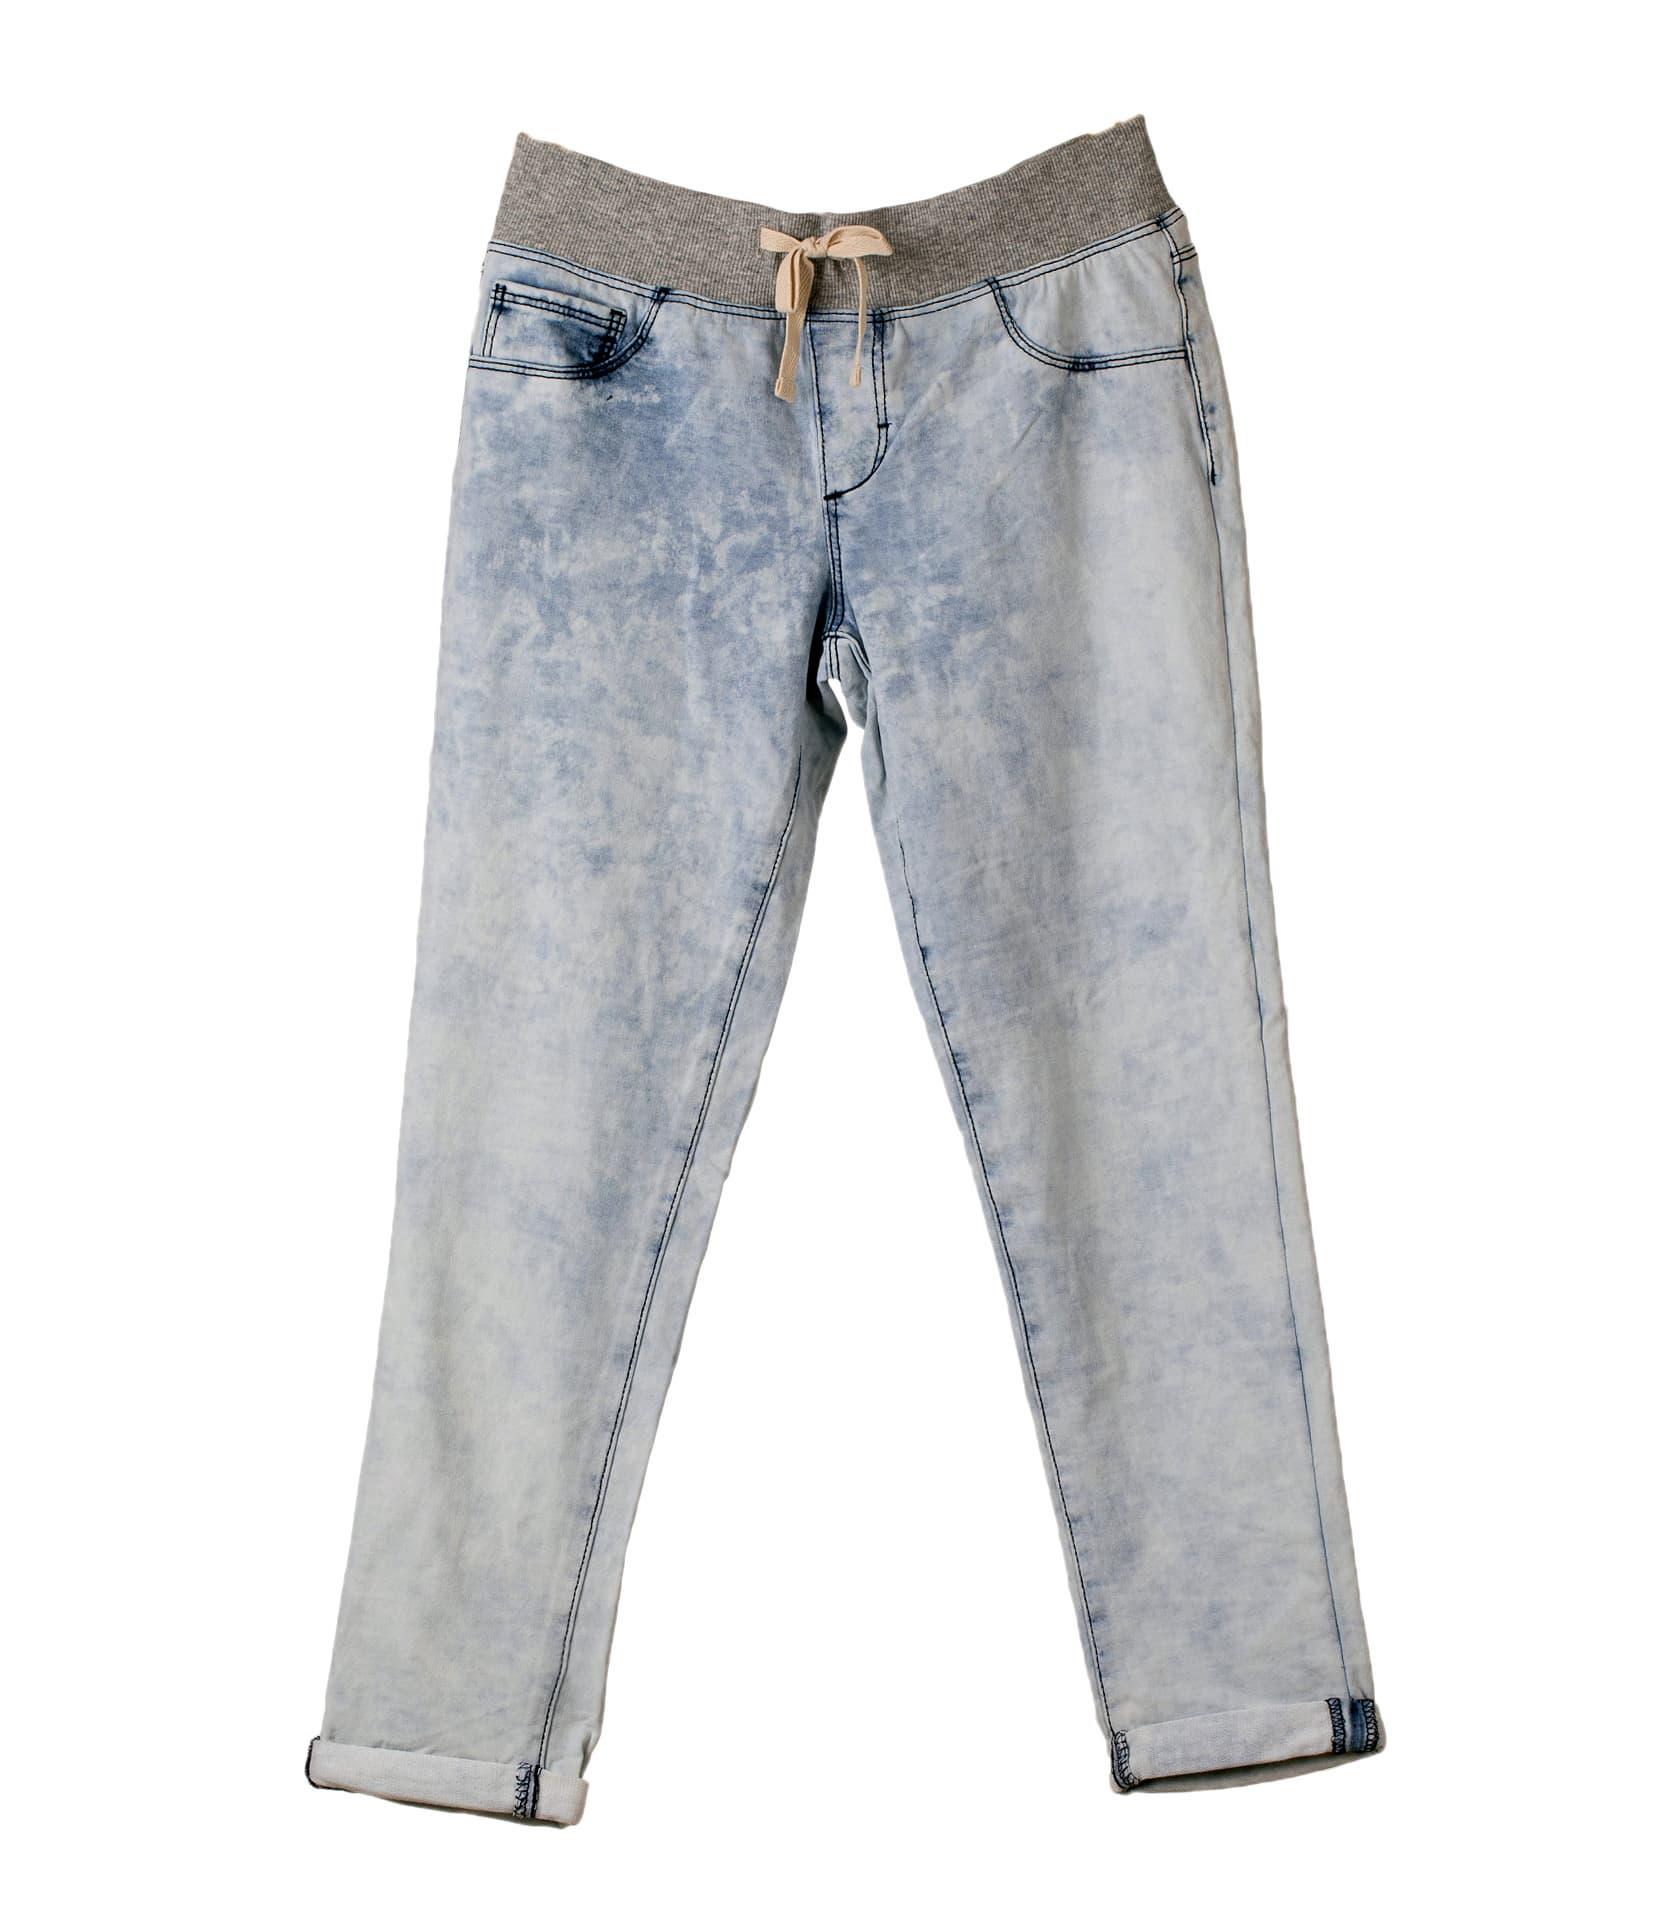 Girls Knit Denim Pant/Trouser Garments Stock Lot   tradekorea